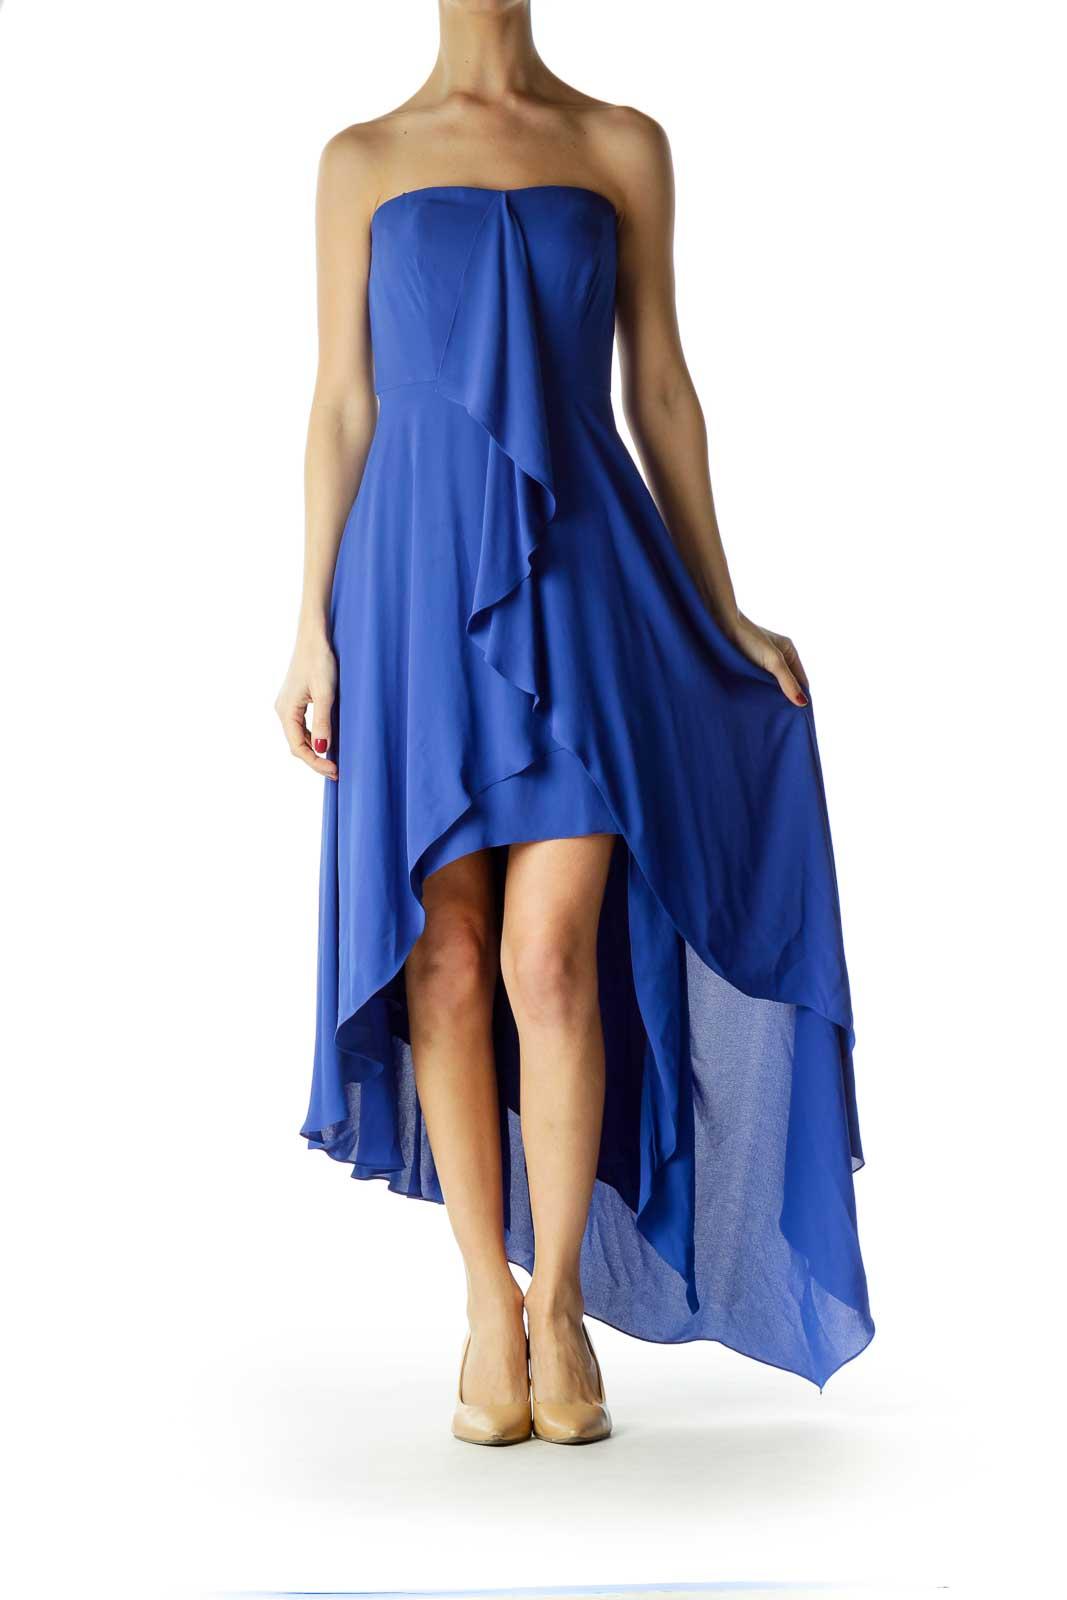 Blue Strapless High-Low Dress